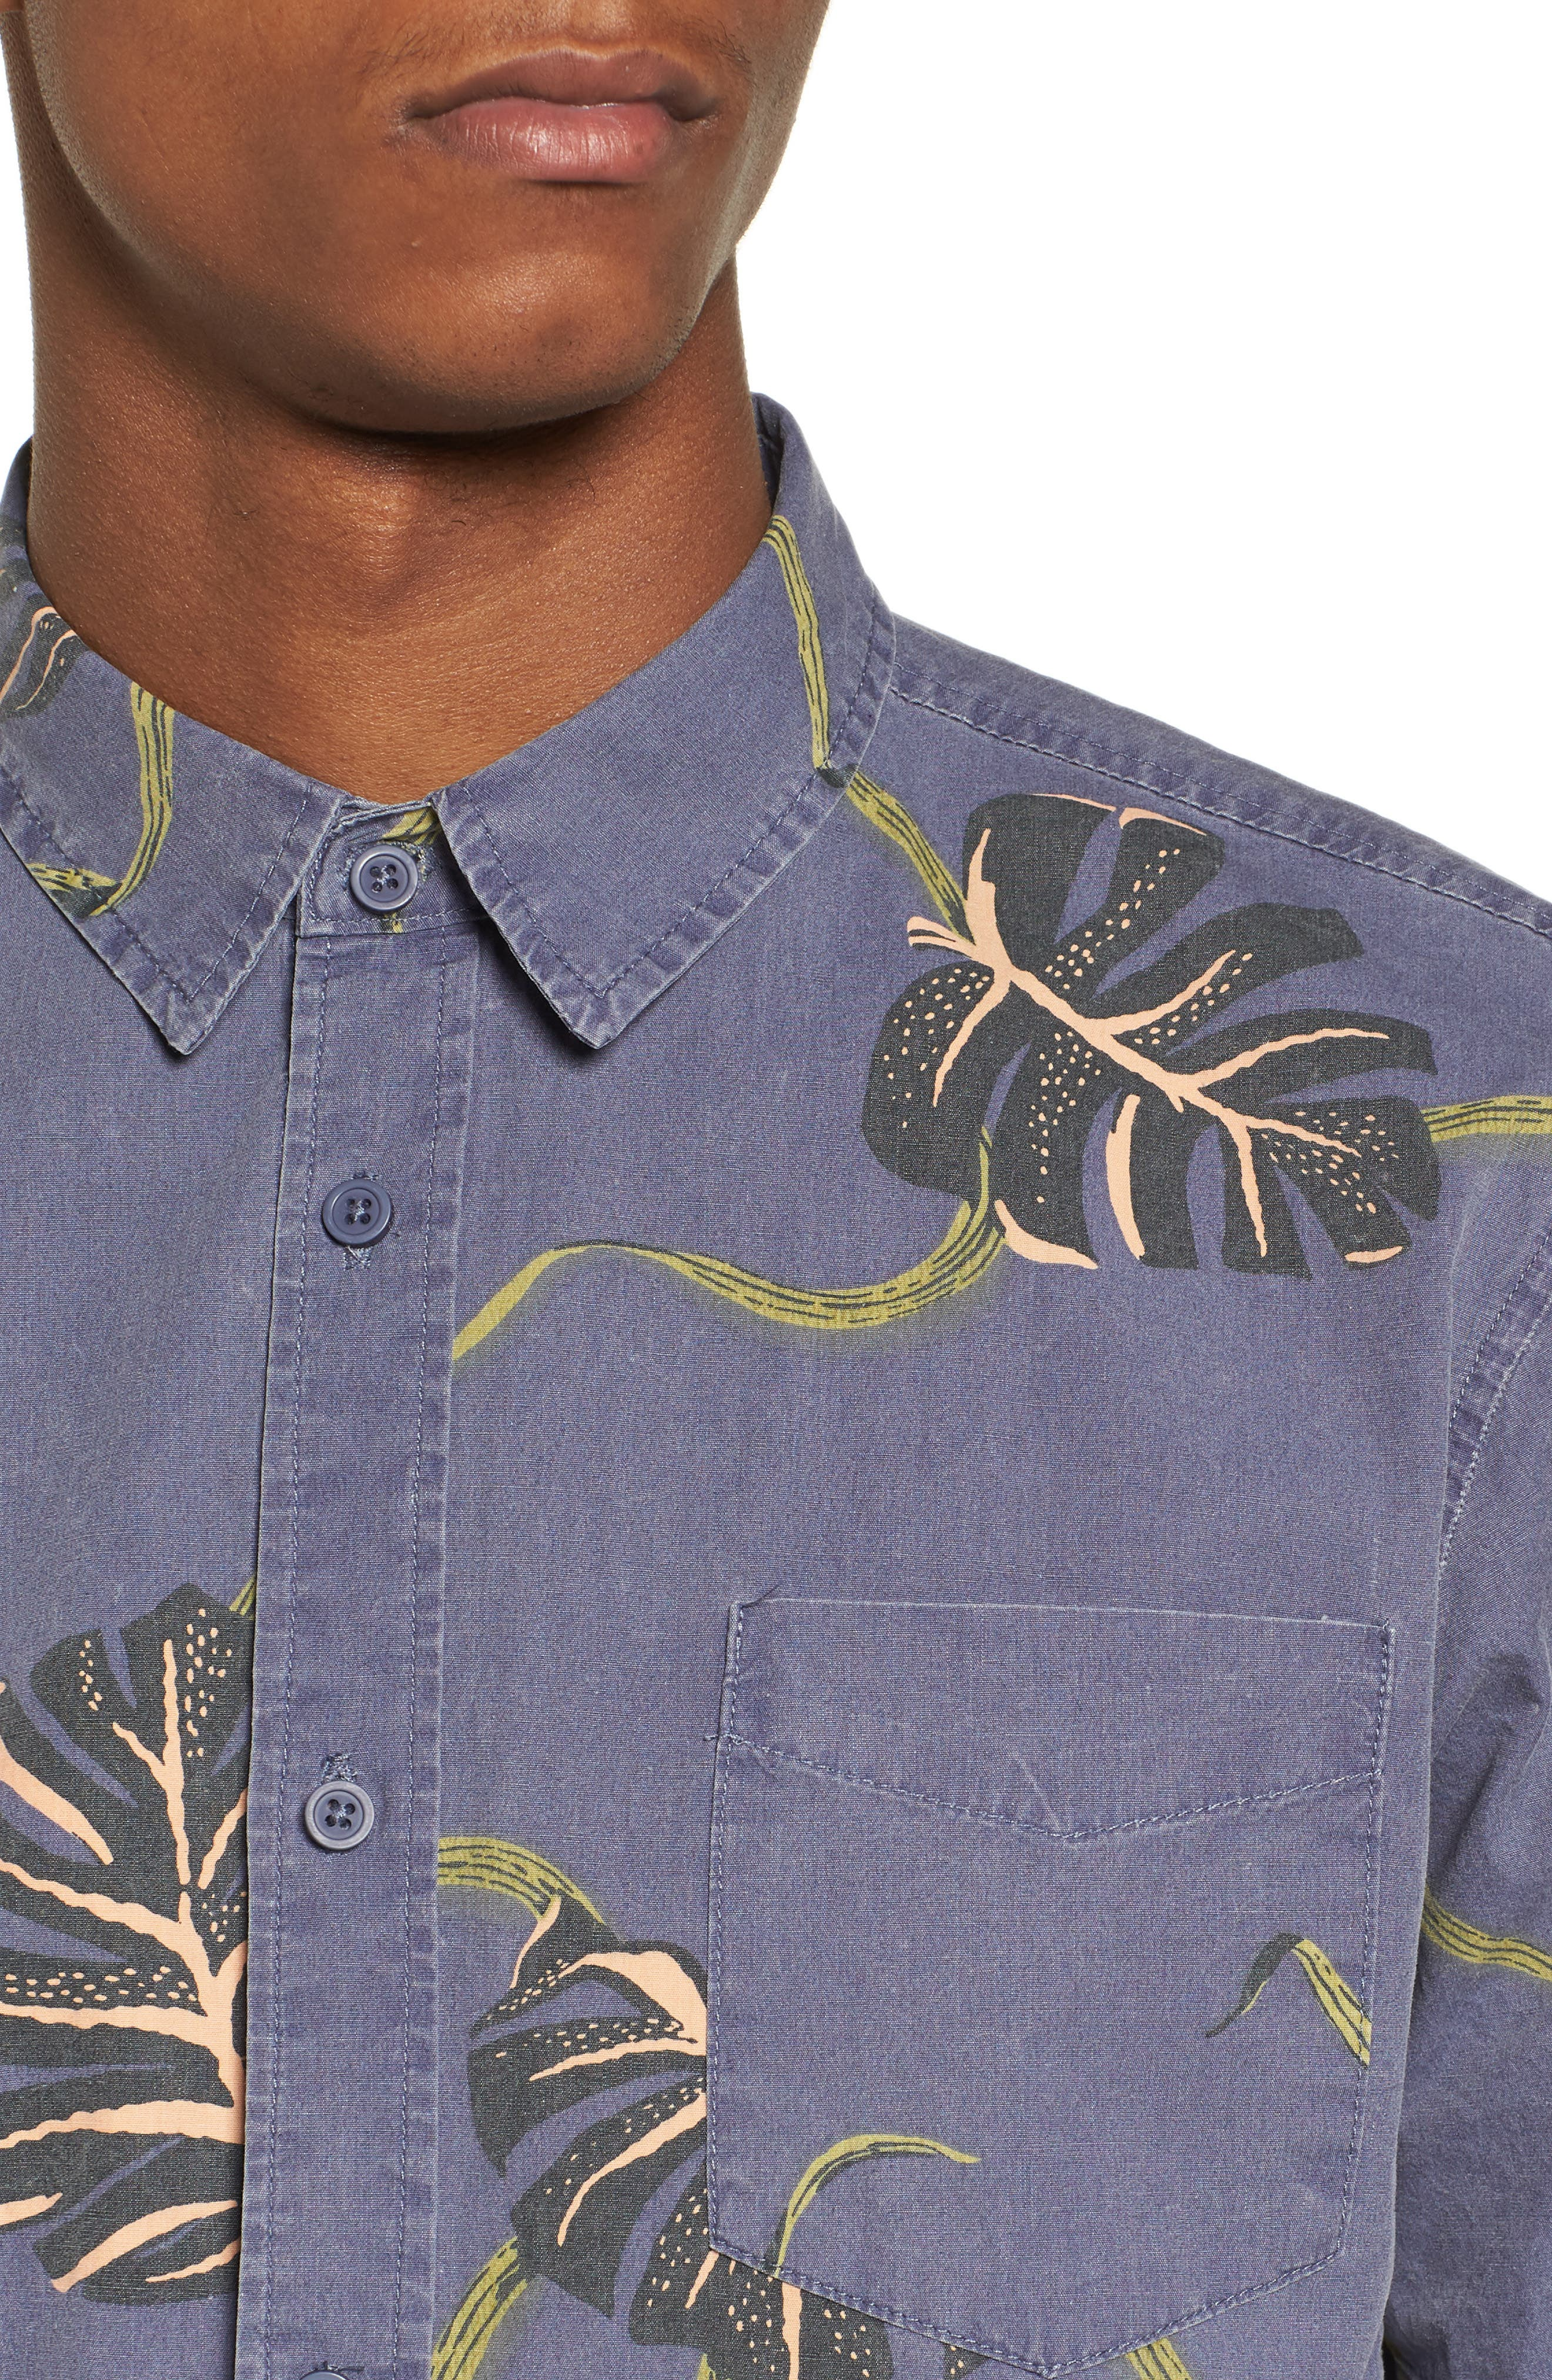 Pointer Woven Shirt,                             Alternate thumbnail 4, color,                             MOONLIGHT BLUE